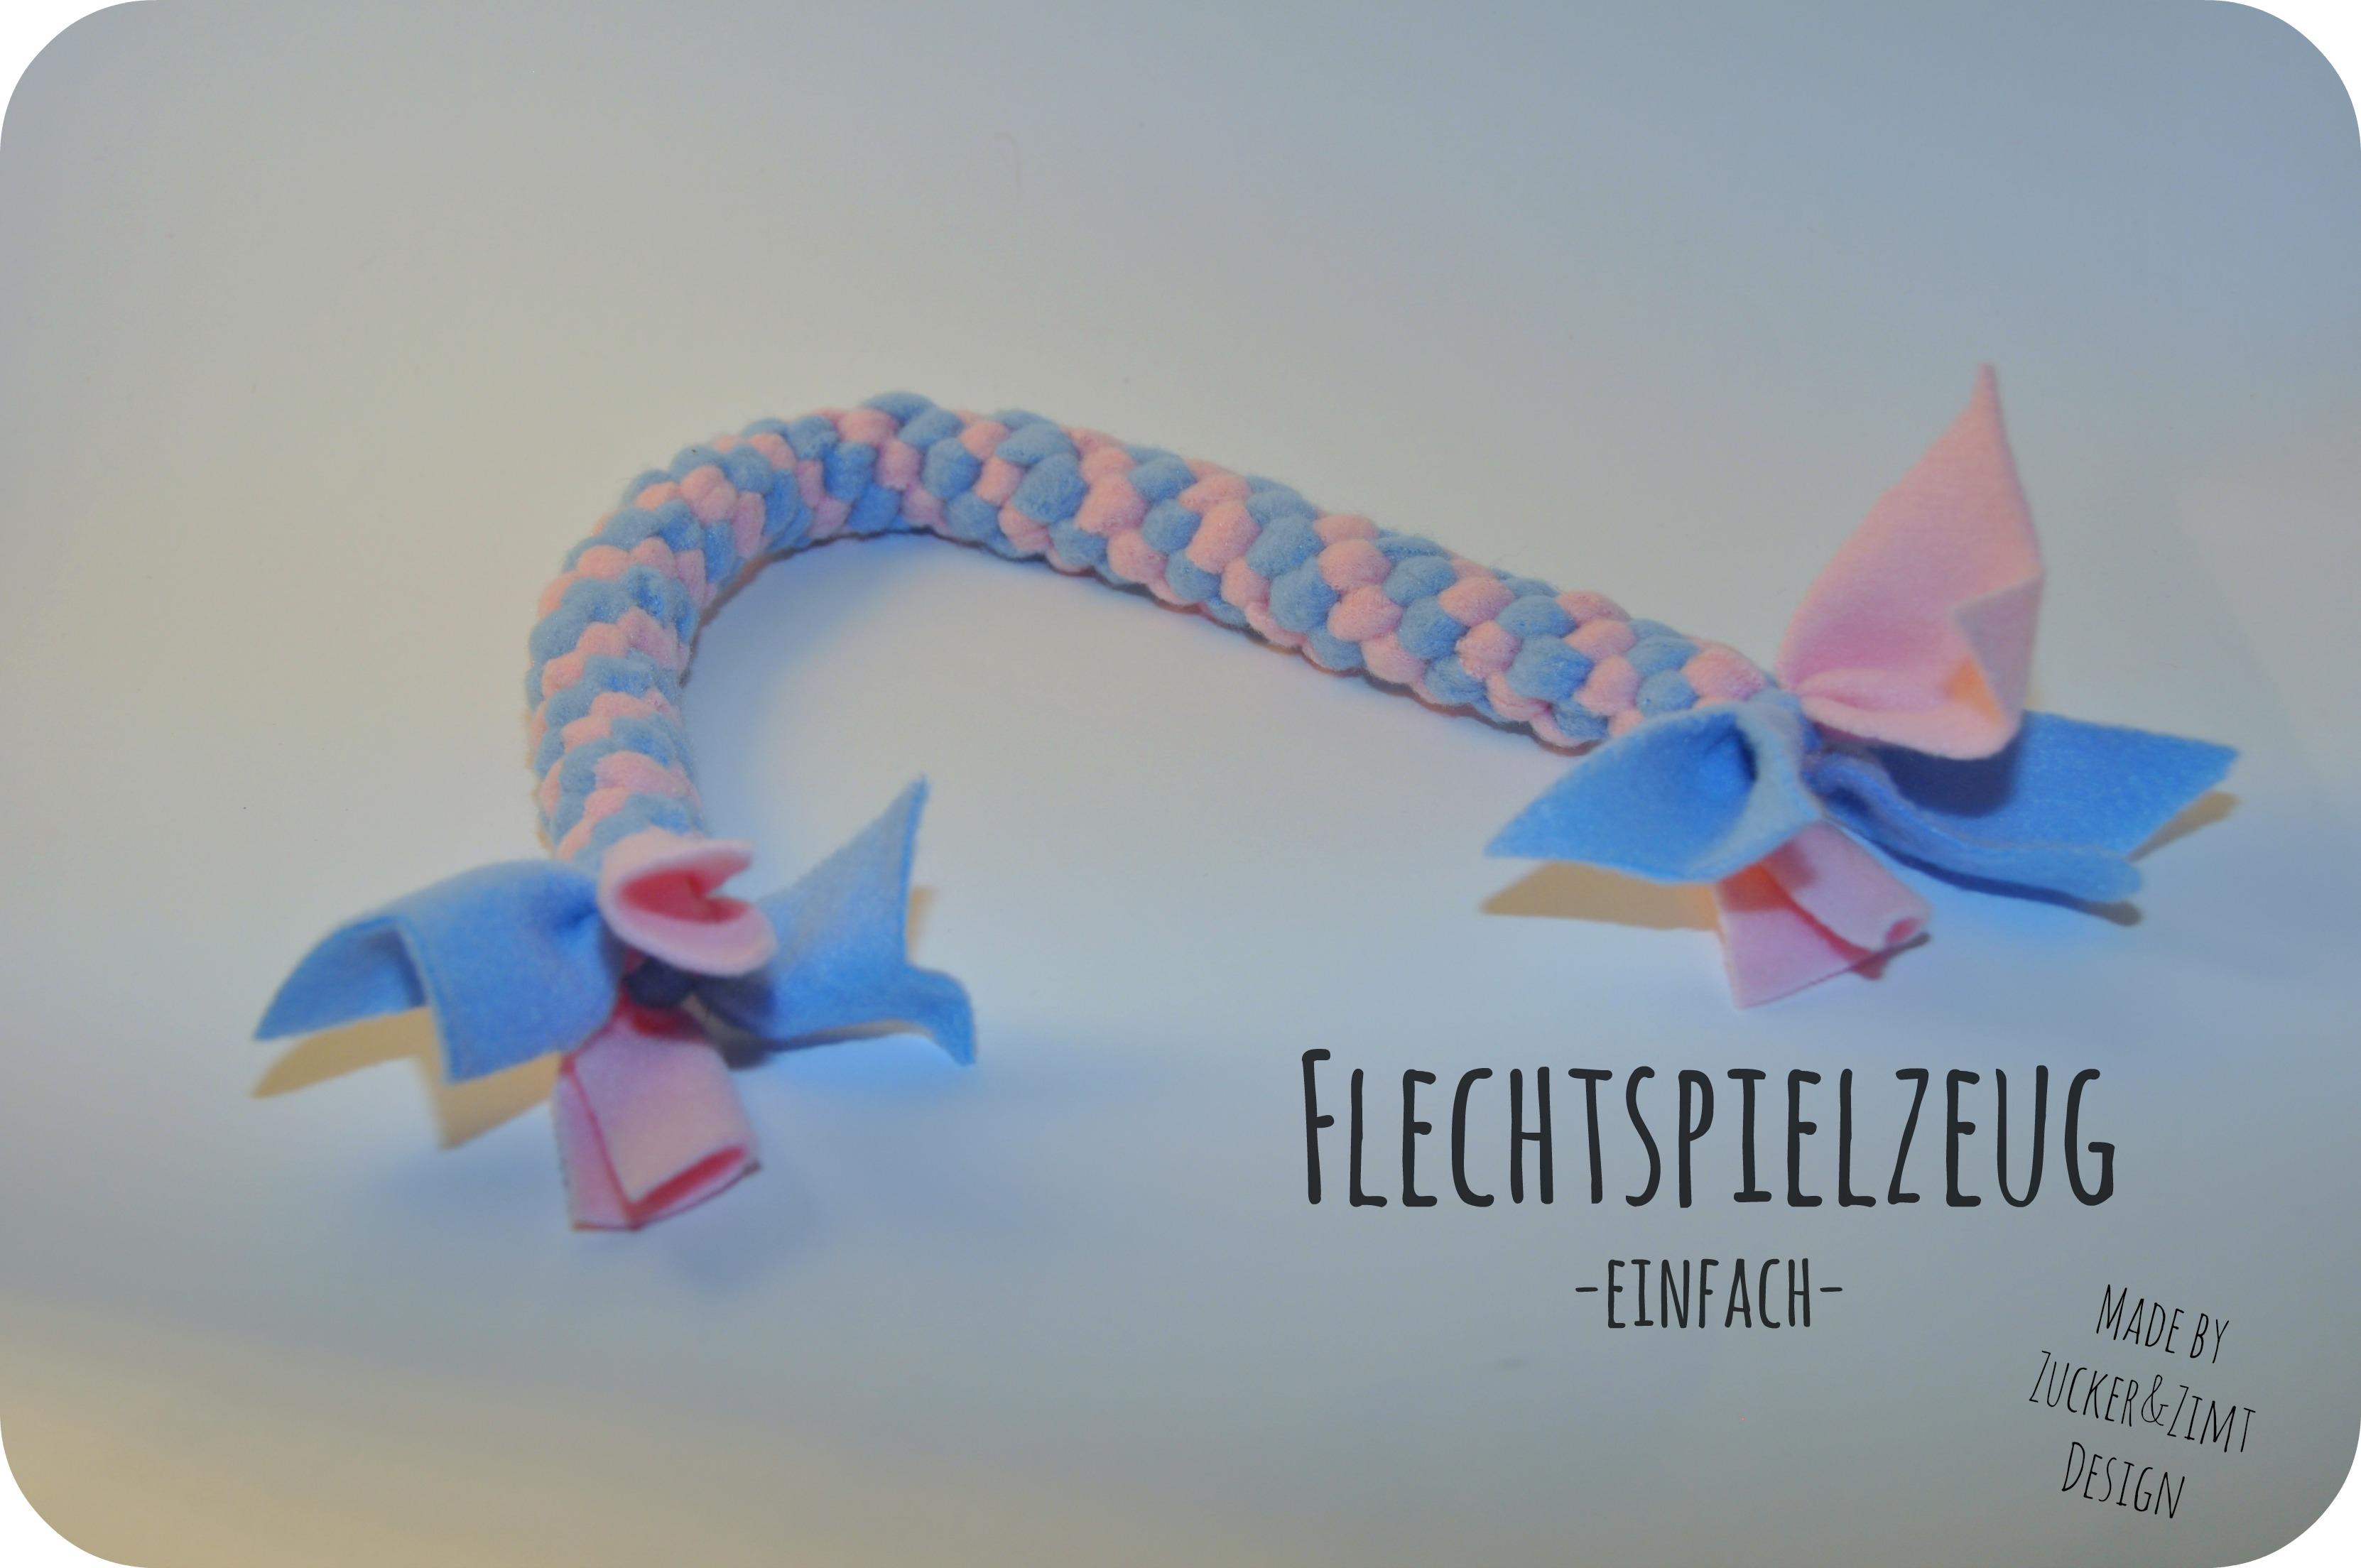 Flechtspielzeug1